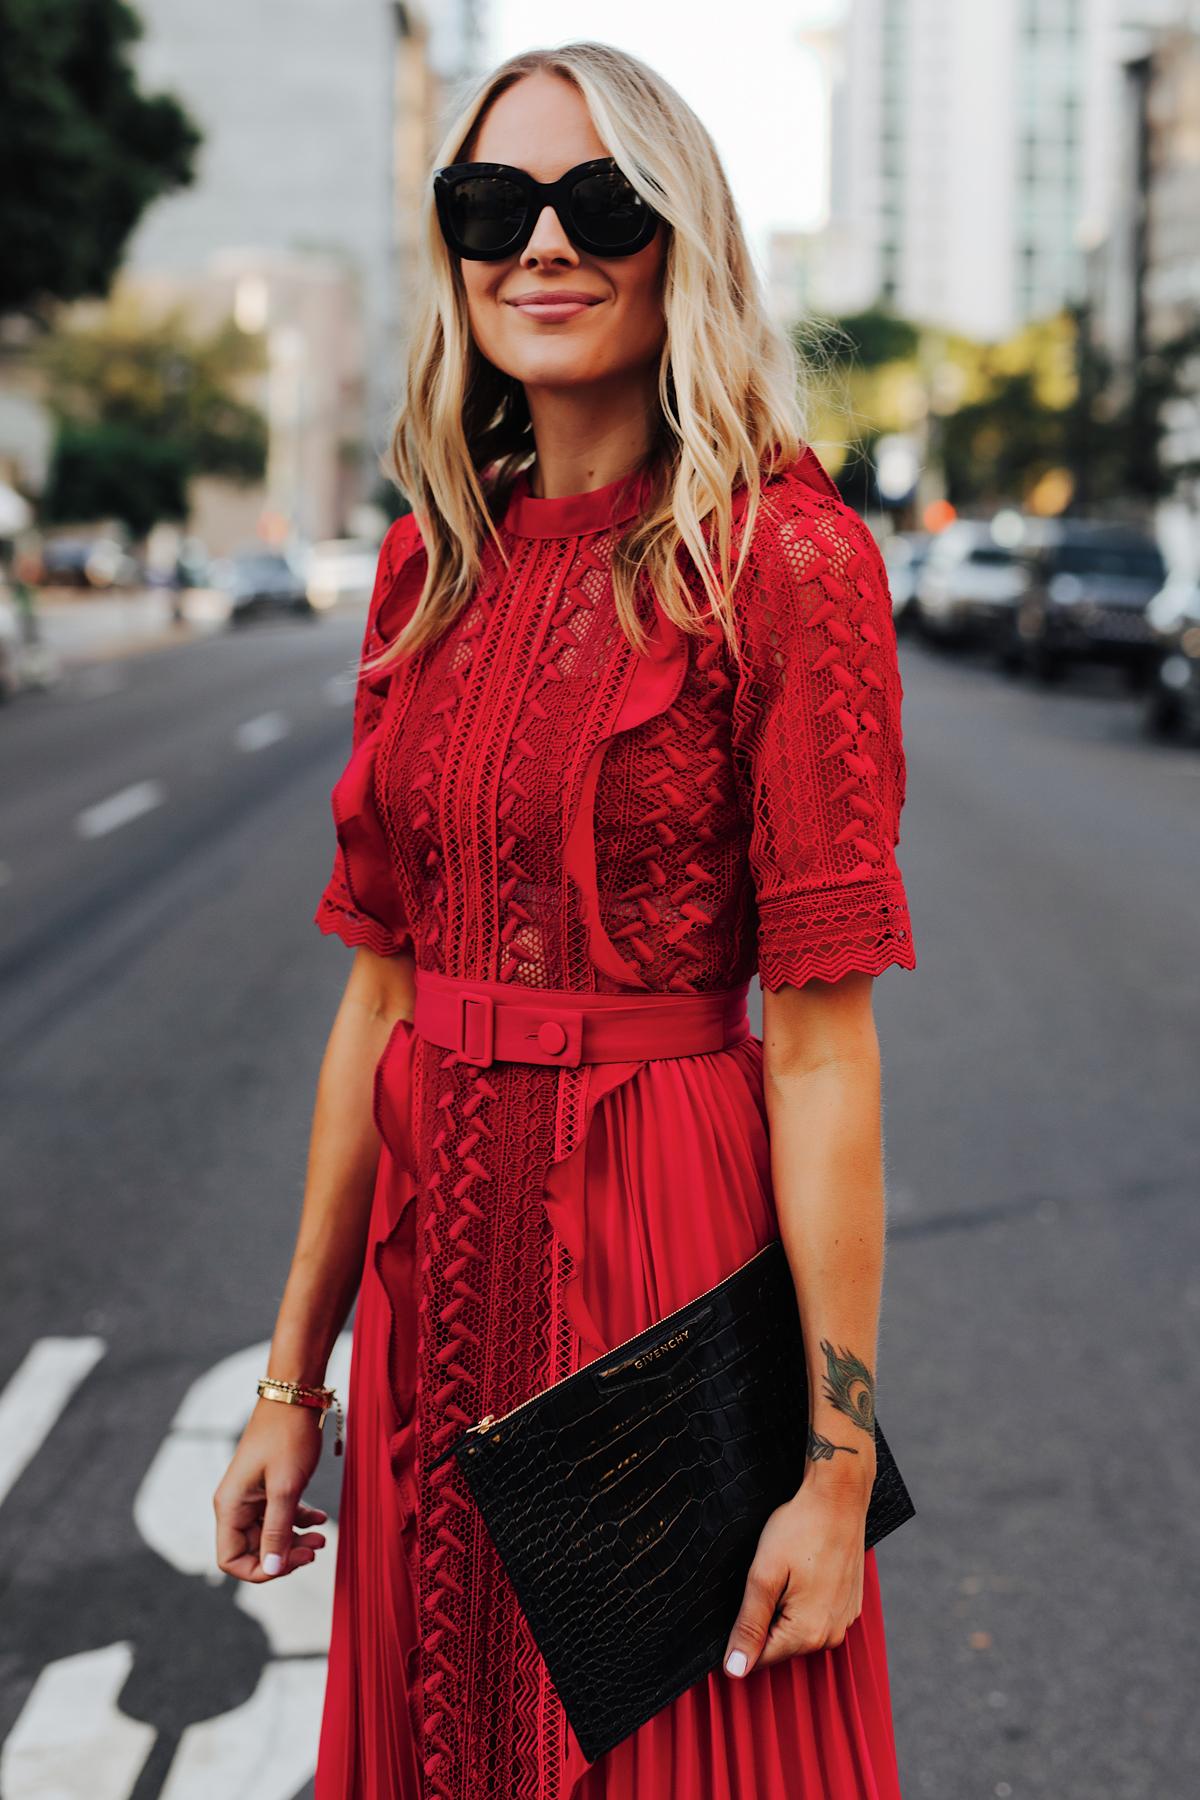 Fashion Jackson Wearing Self Portrait Red Short Sleeve Lace Midi Dress Givenchy Small Croc Black Clutch